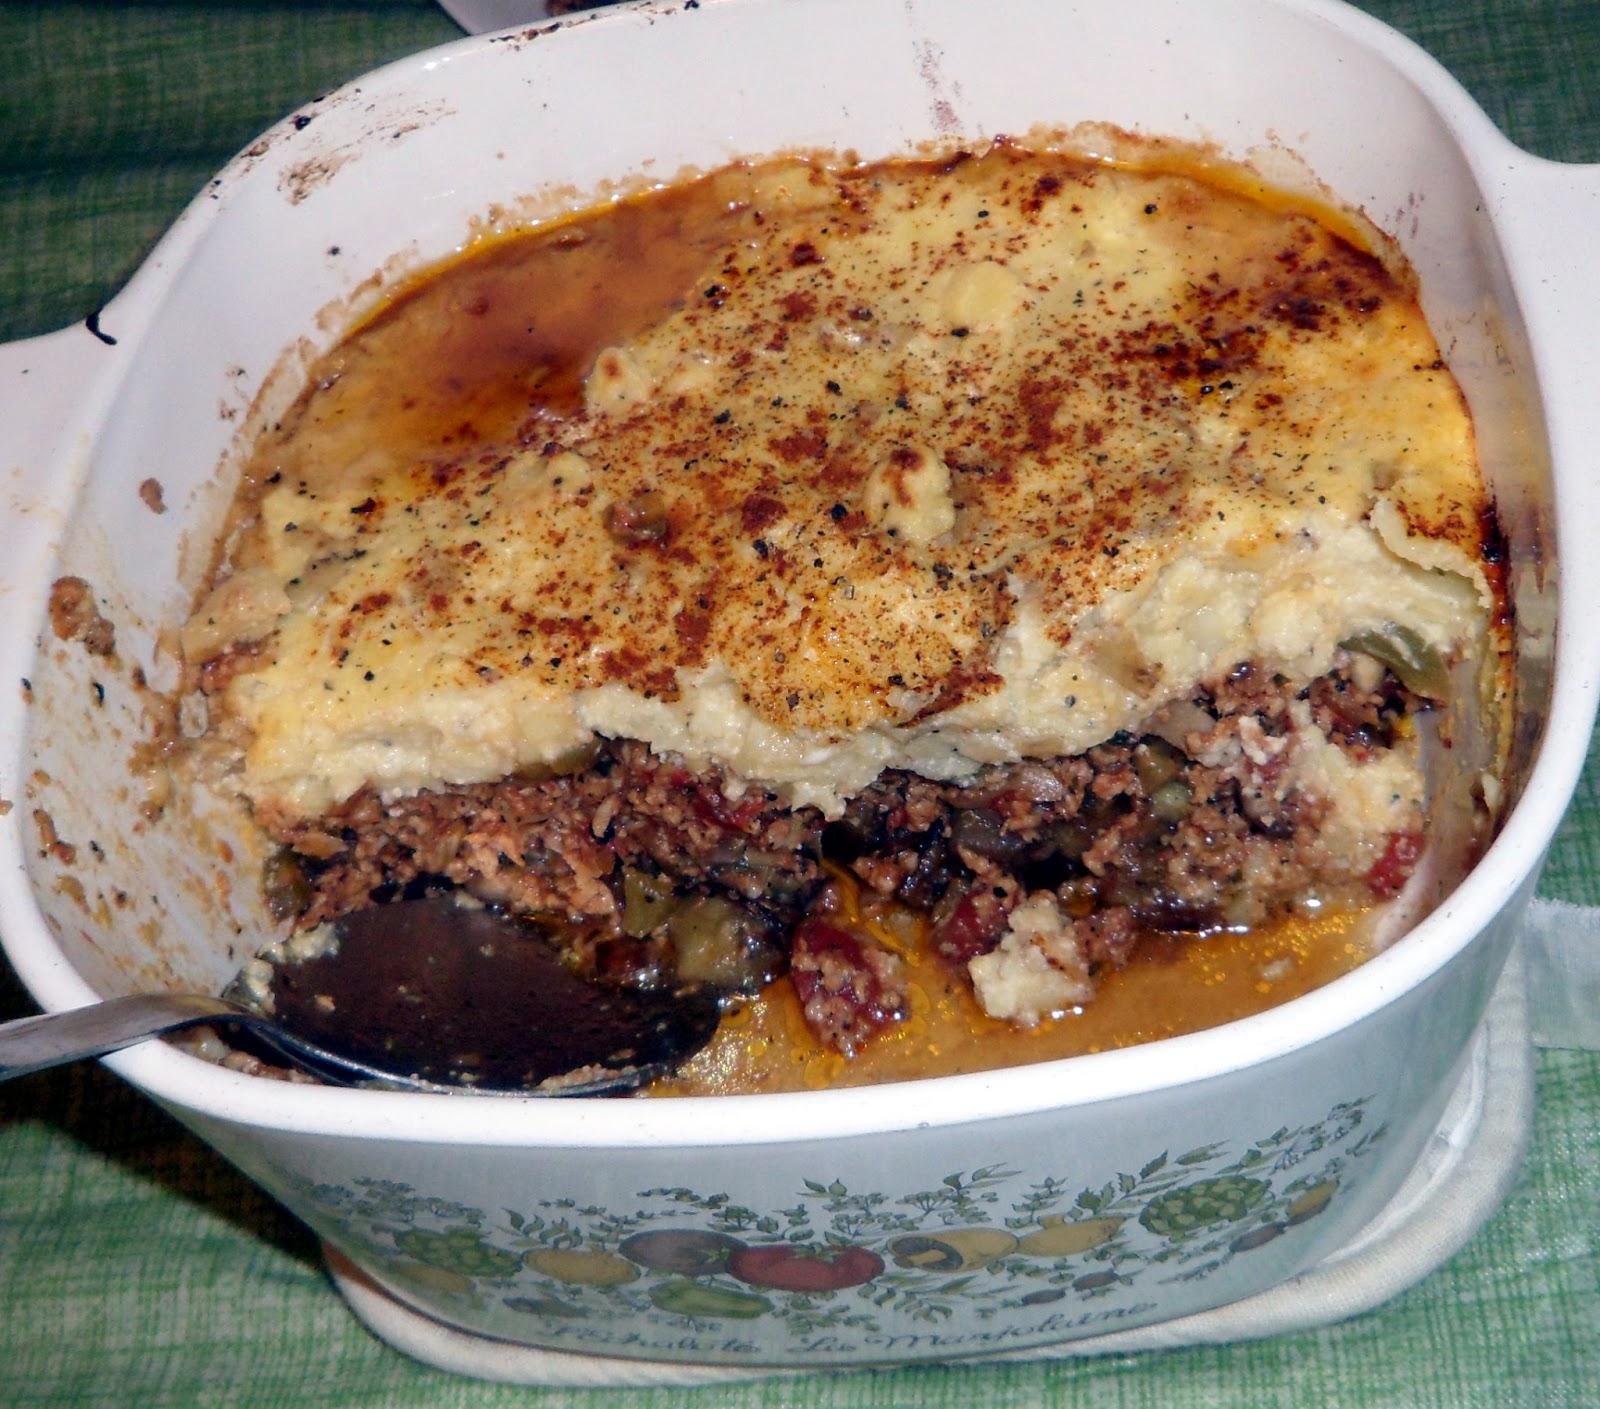 Recipes For Everyone: 2 in 1: Greek Mousaka & American Shepherd's Pie